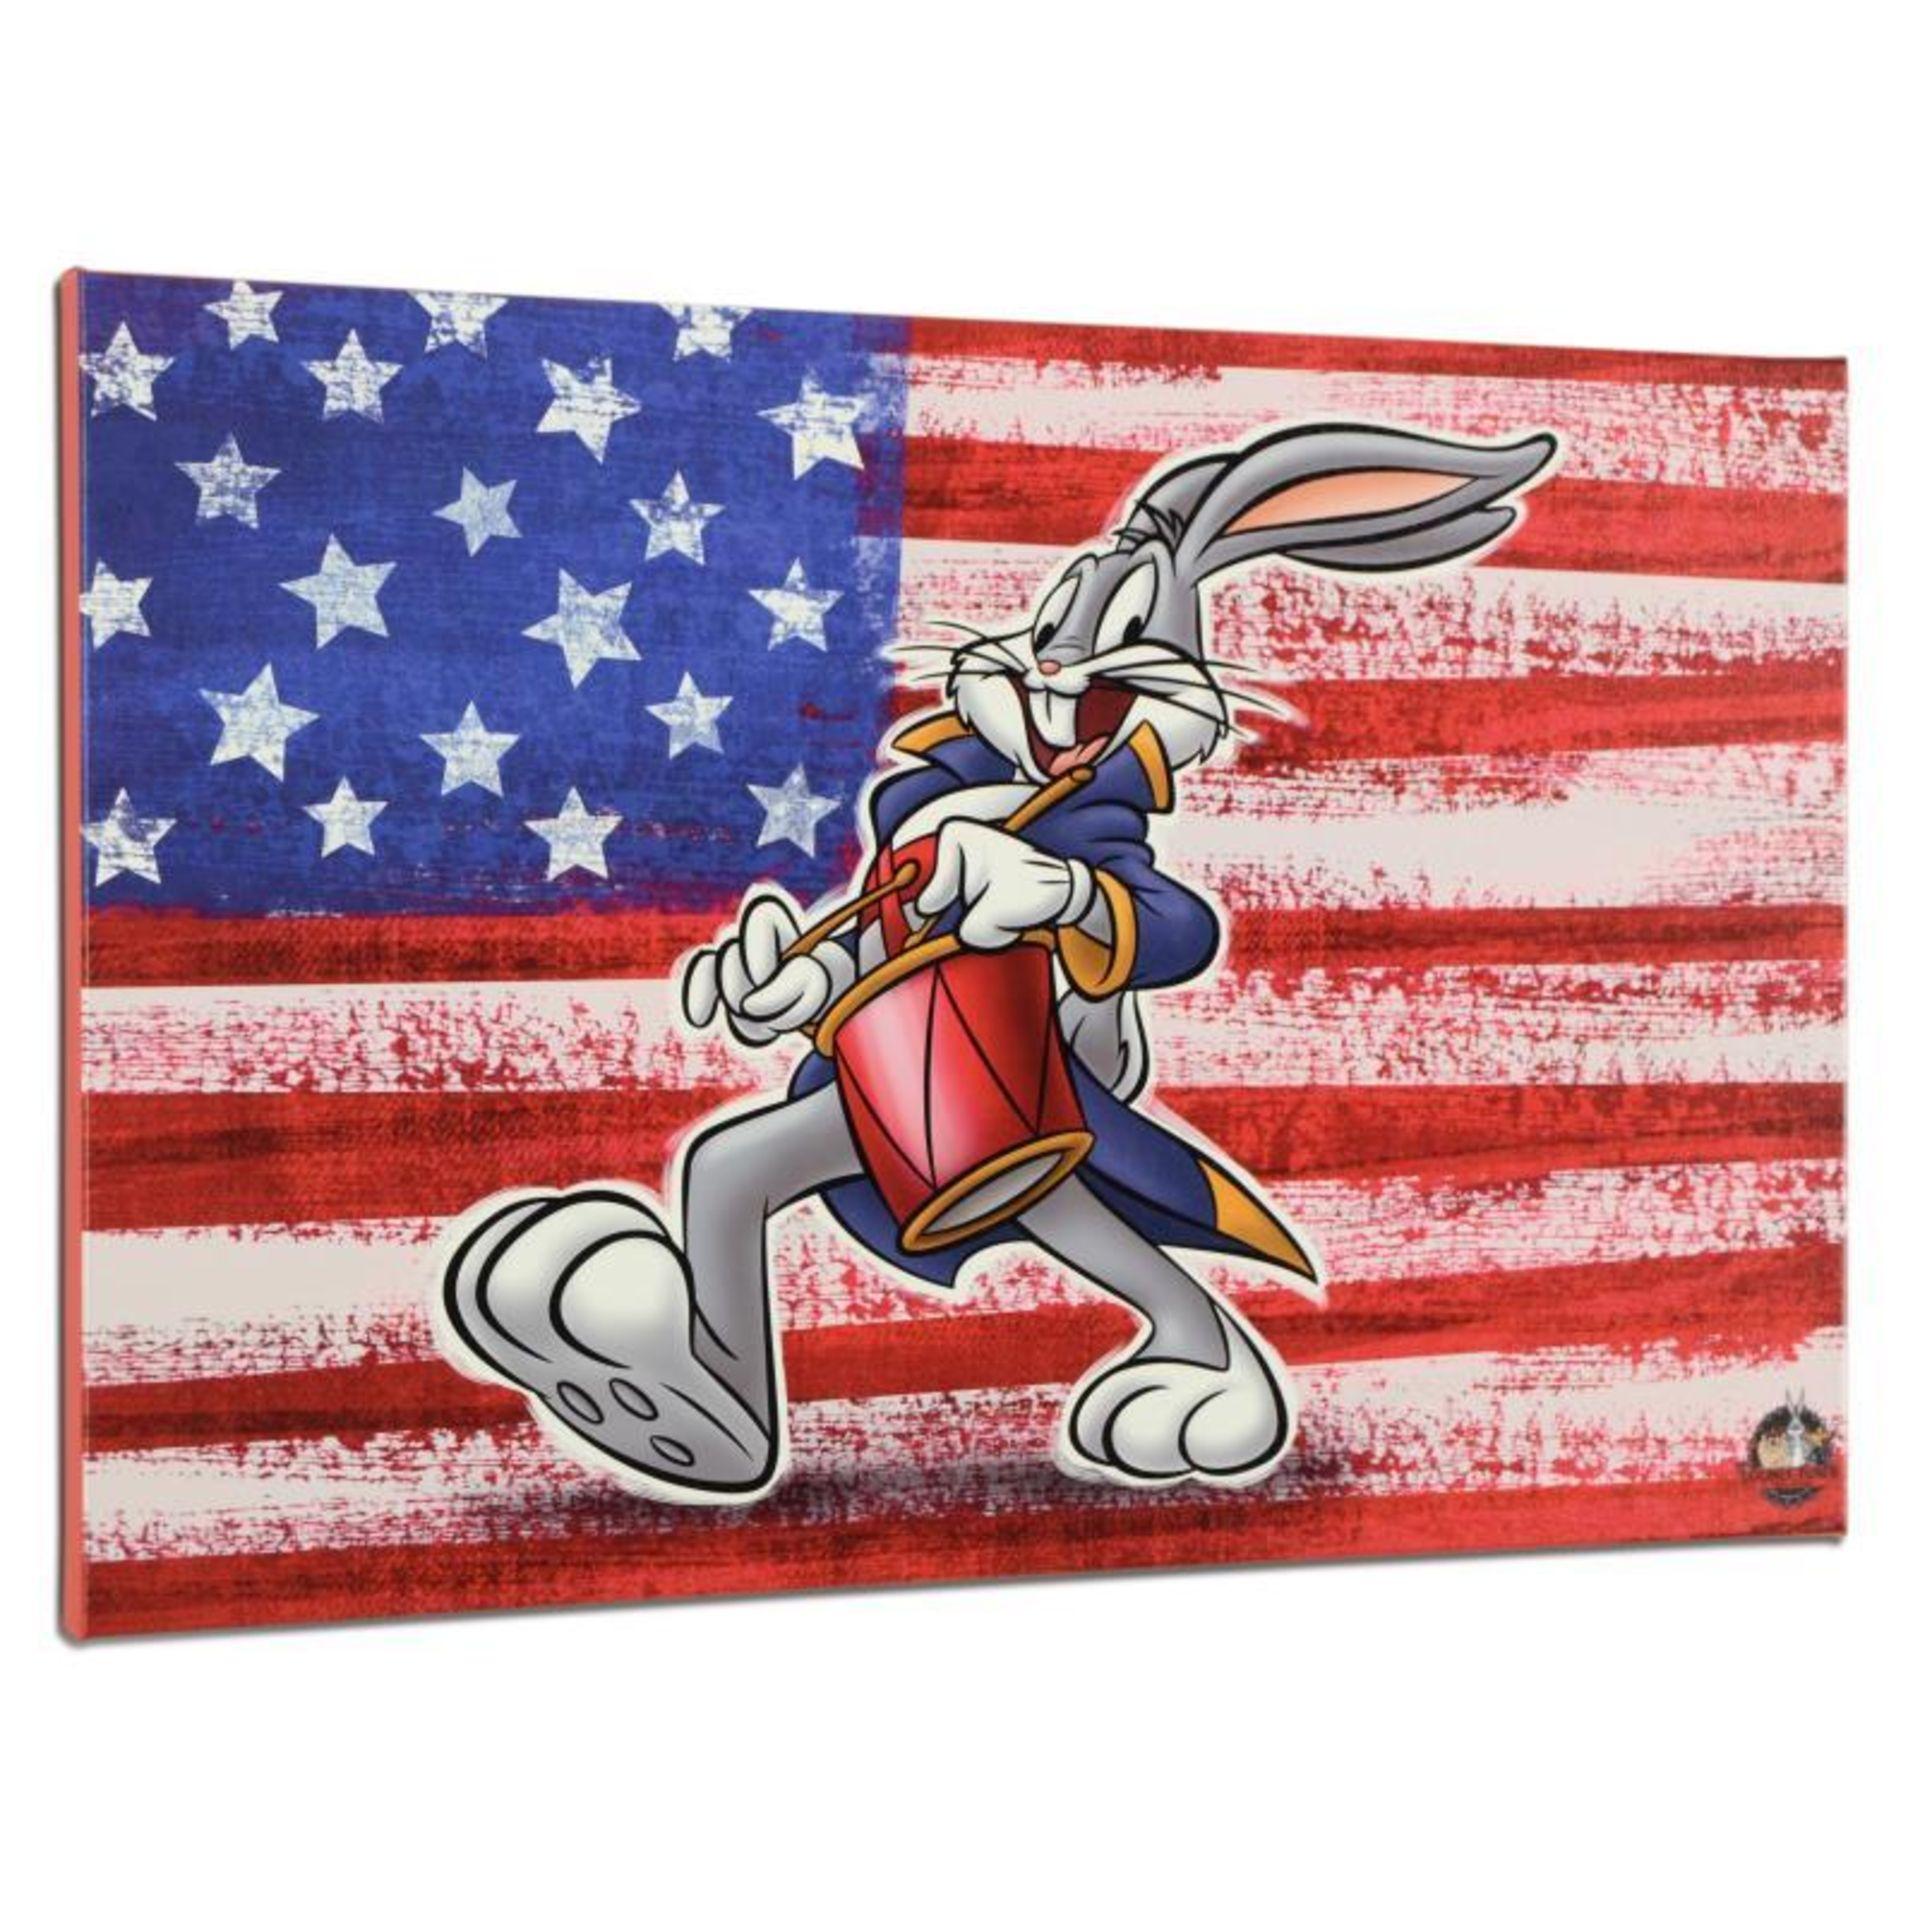 Patriotic Series: Bugs Bunny by Looney Tunes - Image 2 of 2